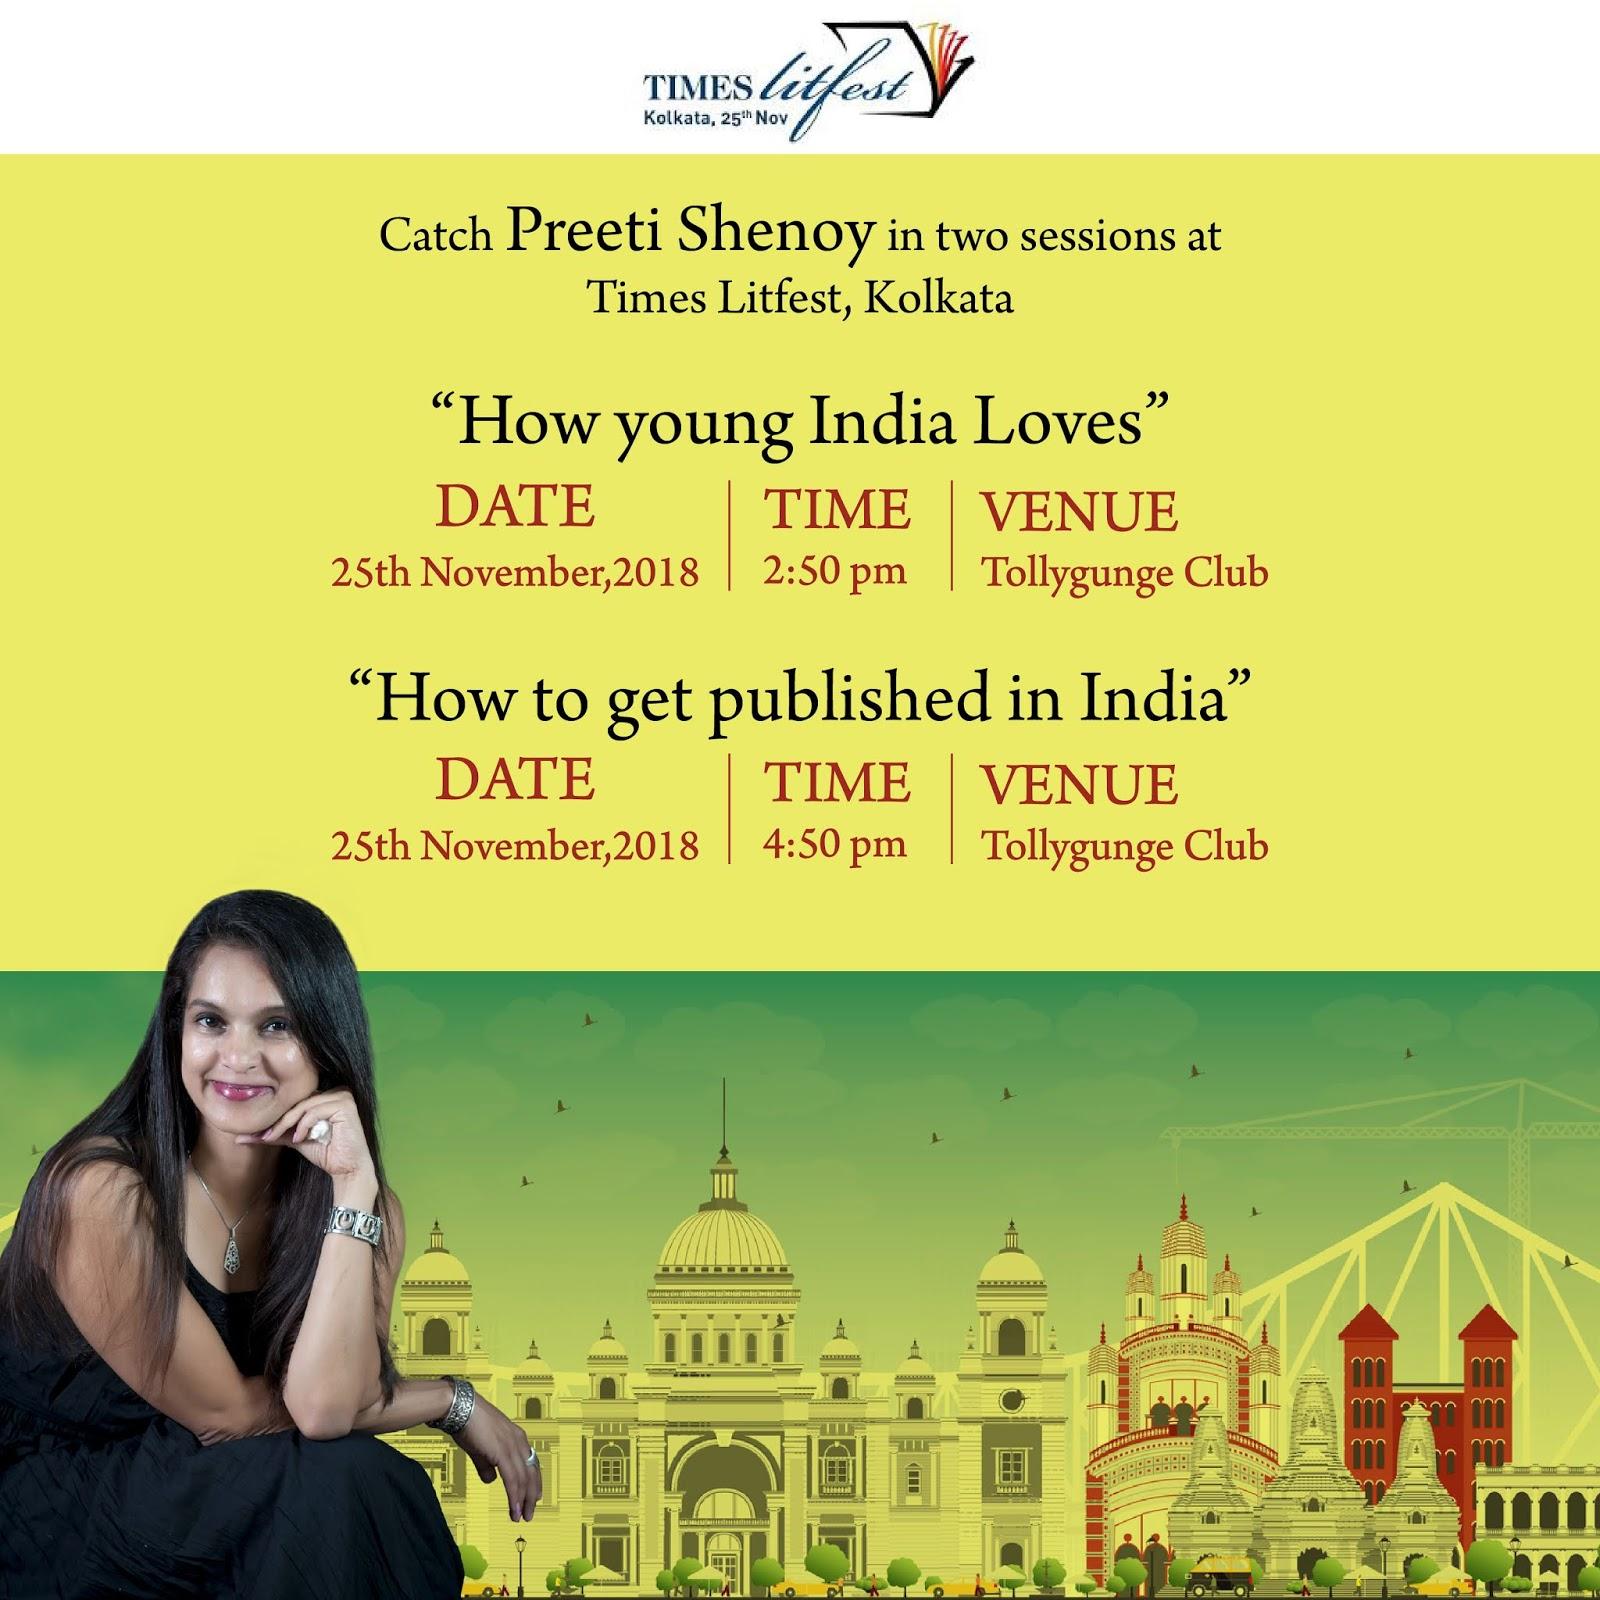 Dating-Club in kolkata